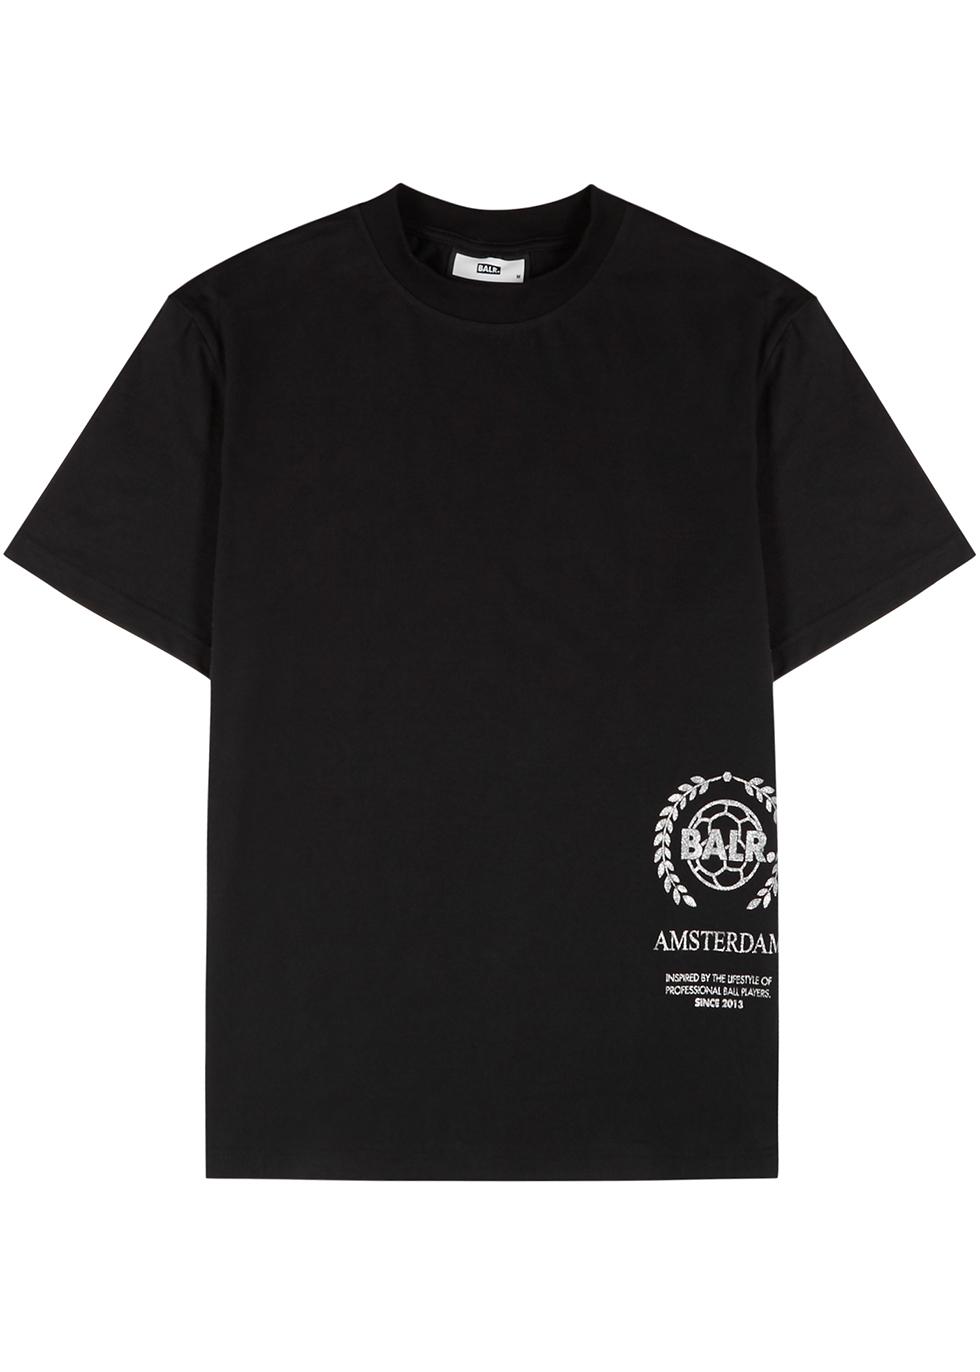 Amsterdam black logo-print cotton T-shirt